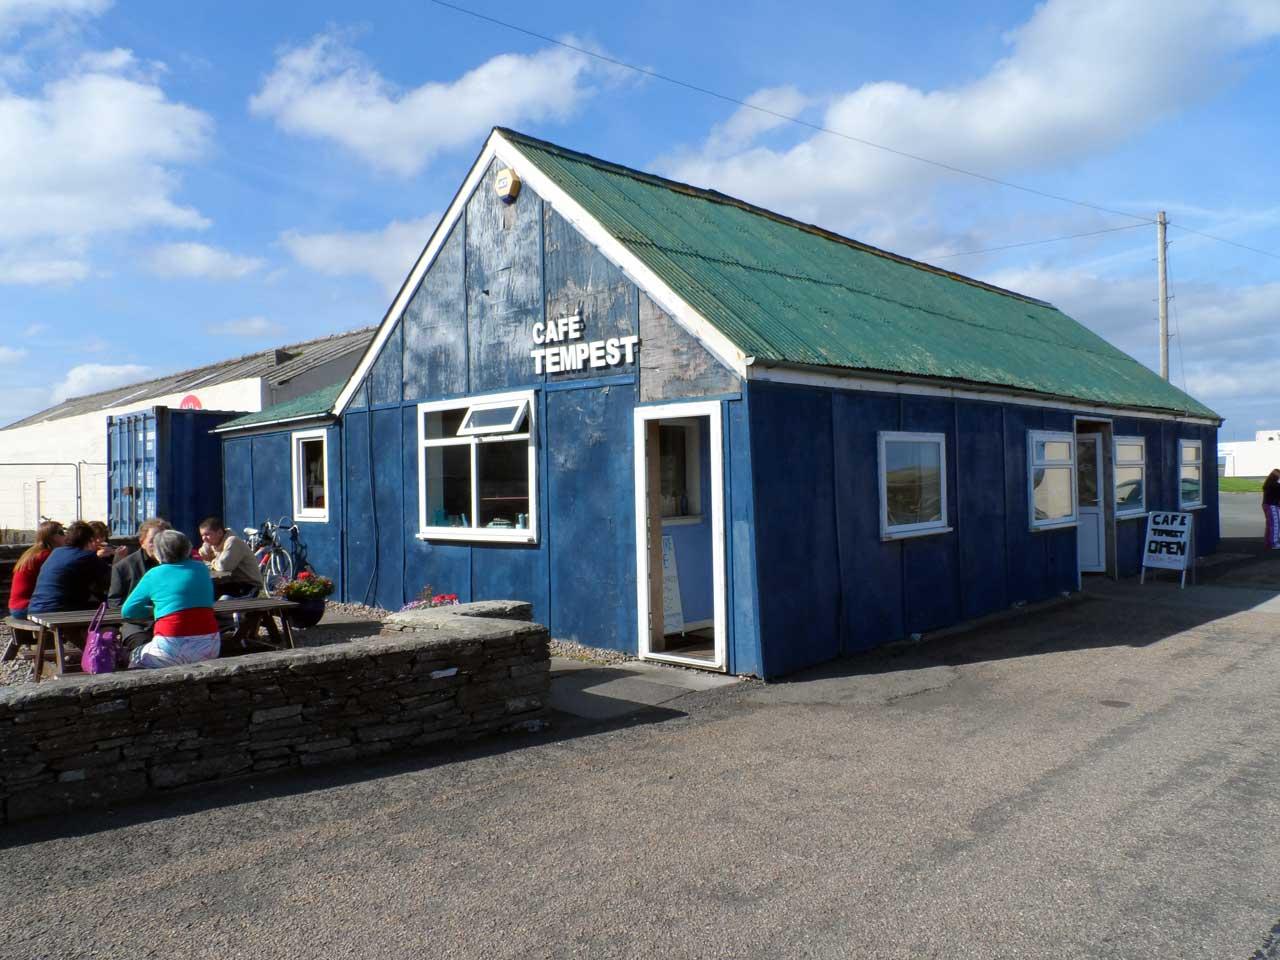 Photo: Cafe Tempest, Thurso - Sun and Surf